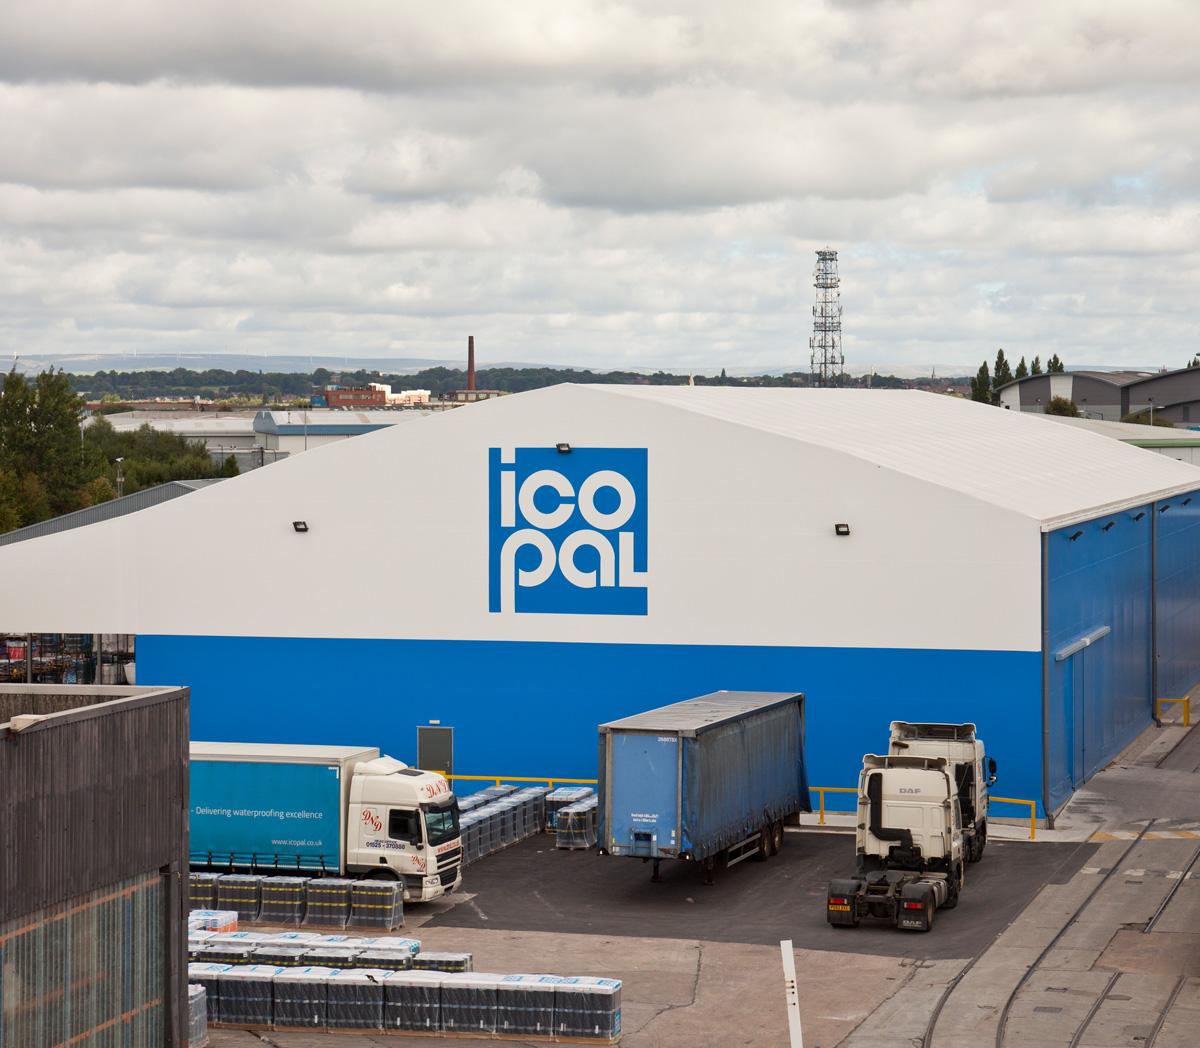 BMI Icopal warehouse